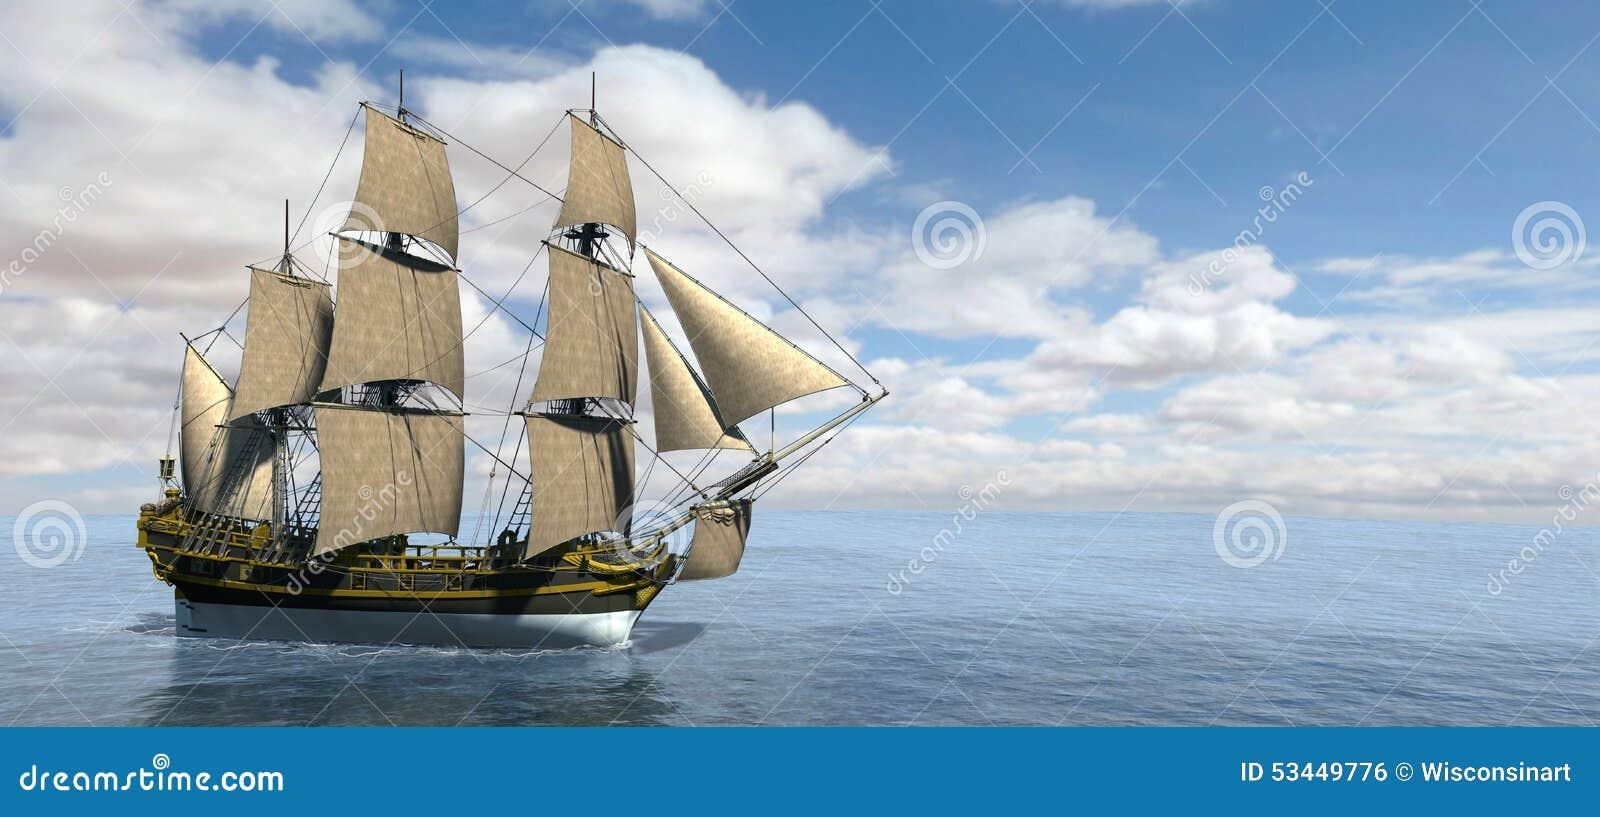 Tall Sailing Ship Banner Panorama Stock Illustration - Image: 53449776